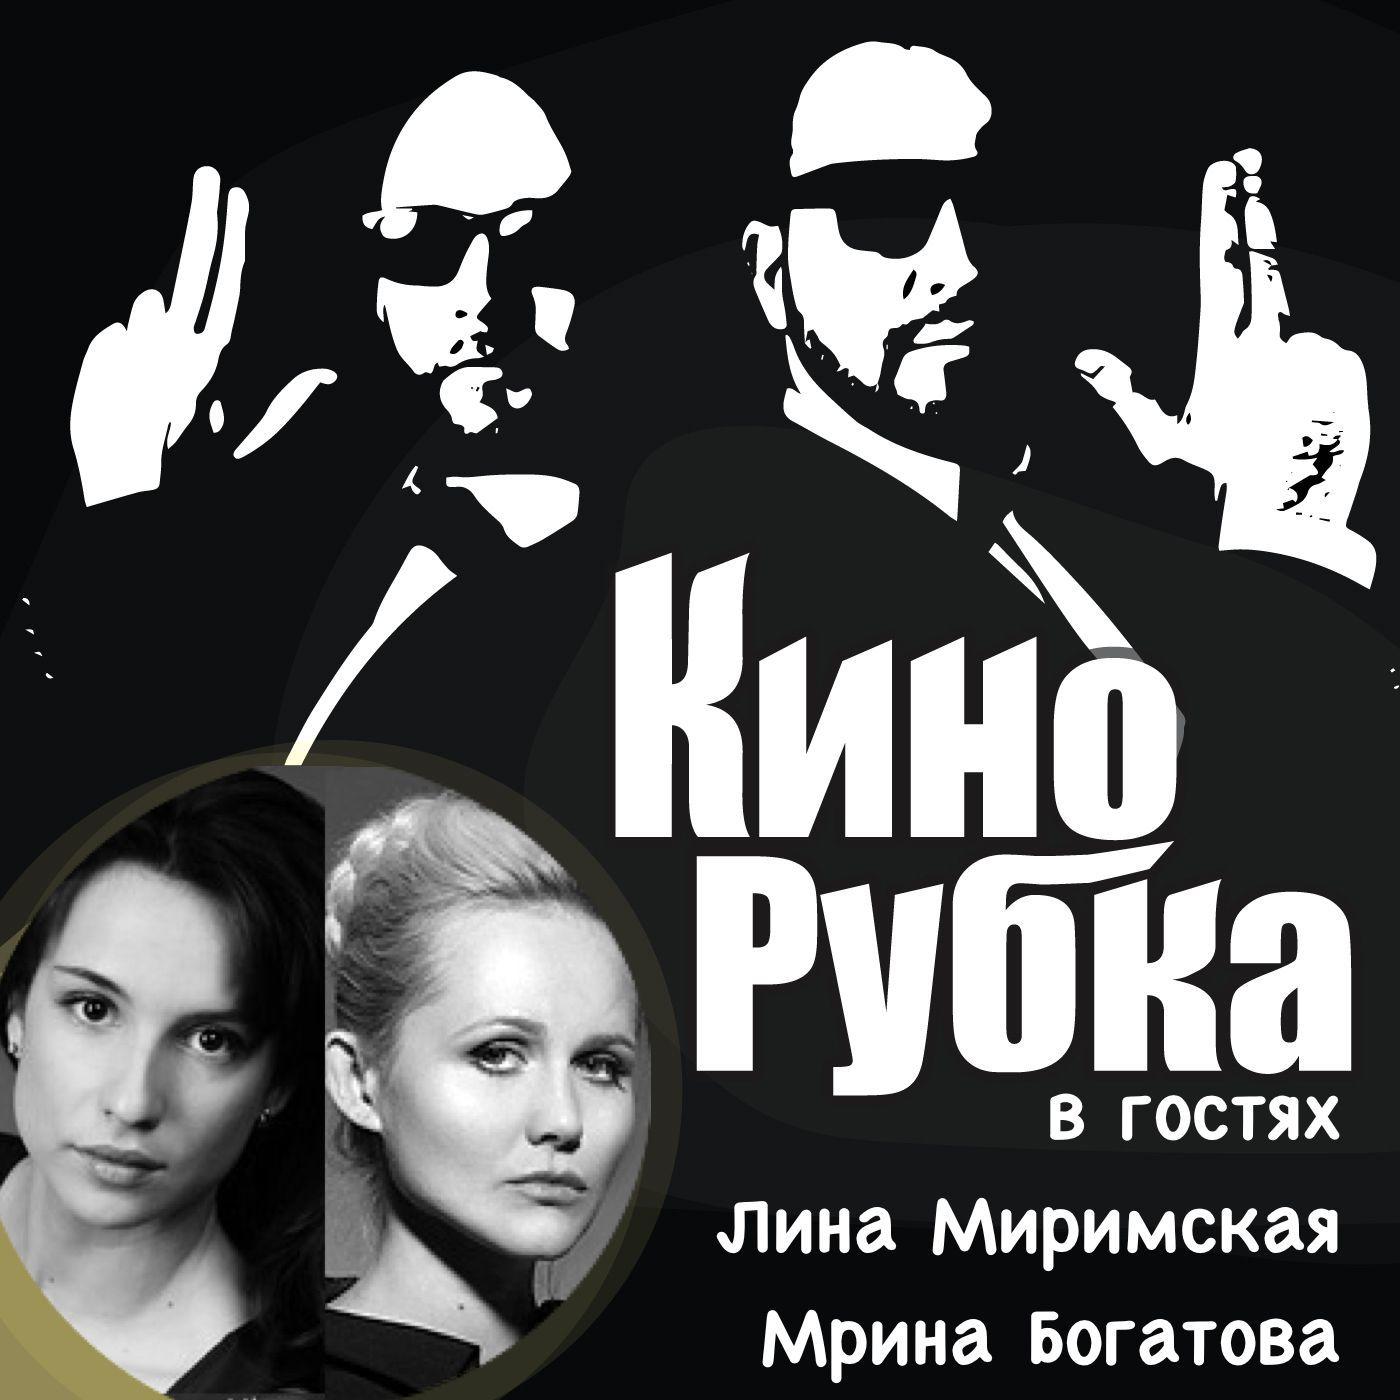 Актрисы театра и кино Лина Миримская и Марина Богатова